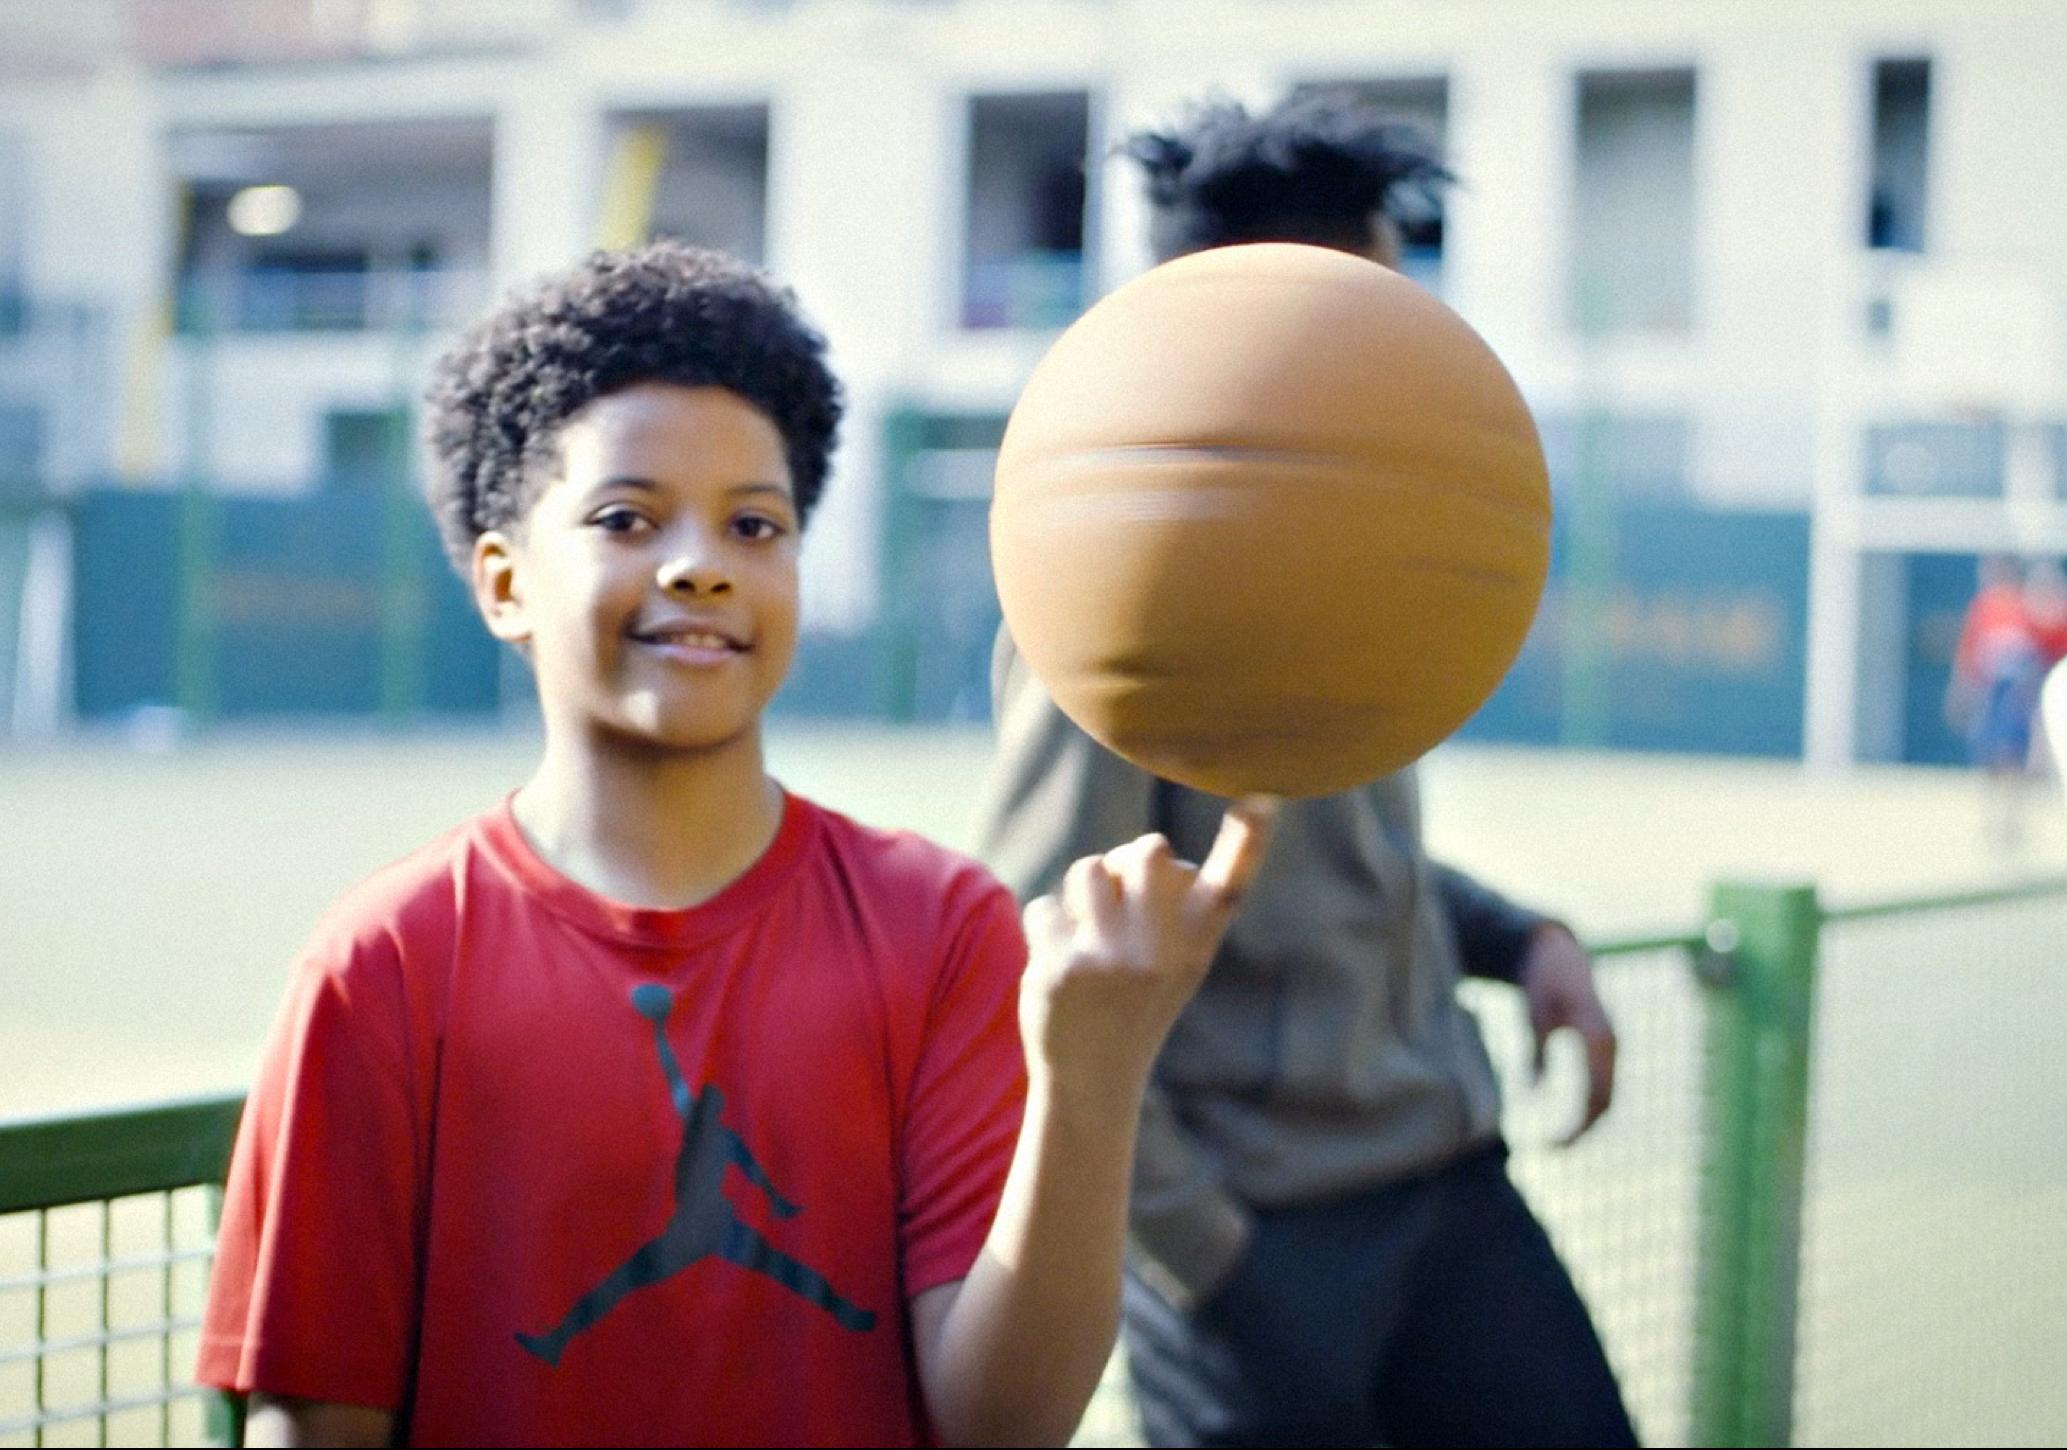 boy spinning basketball